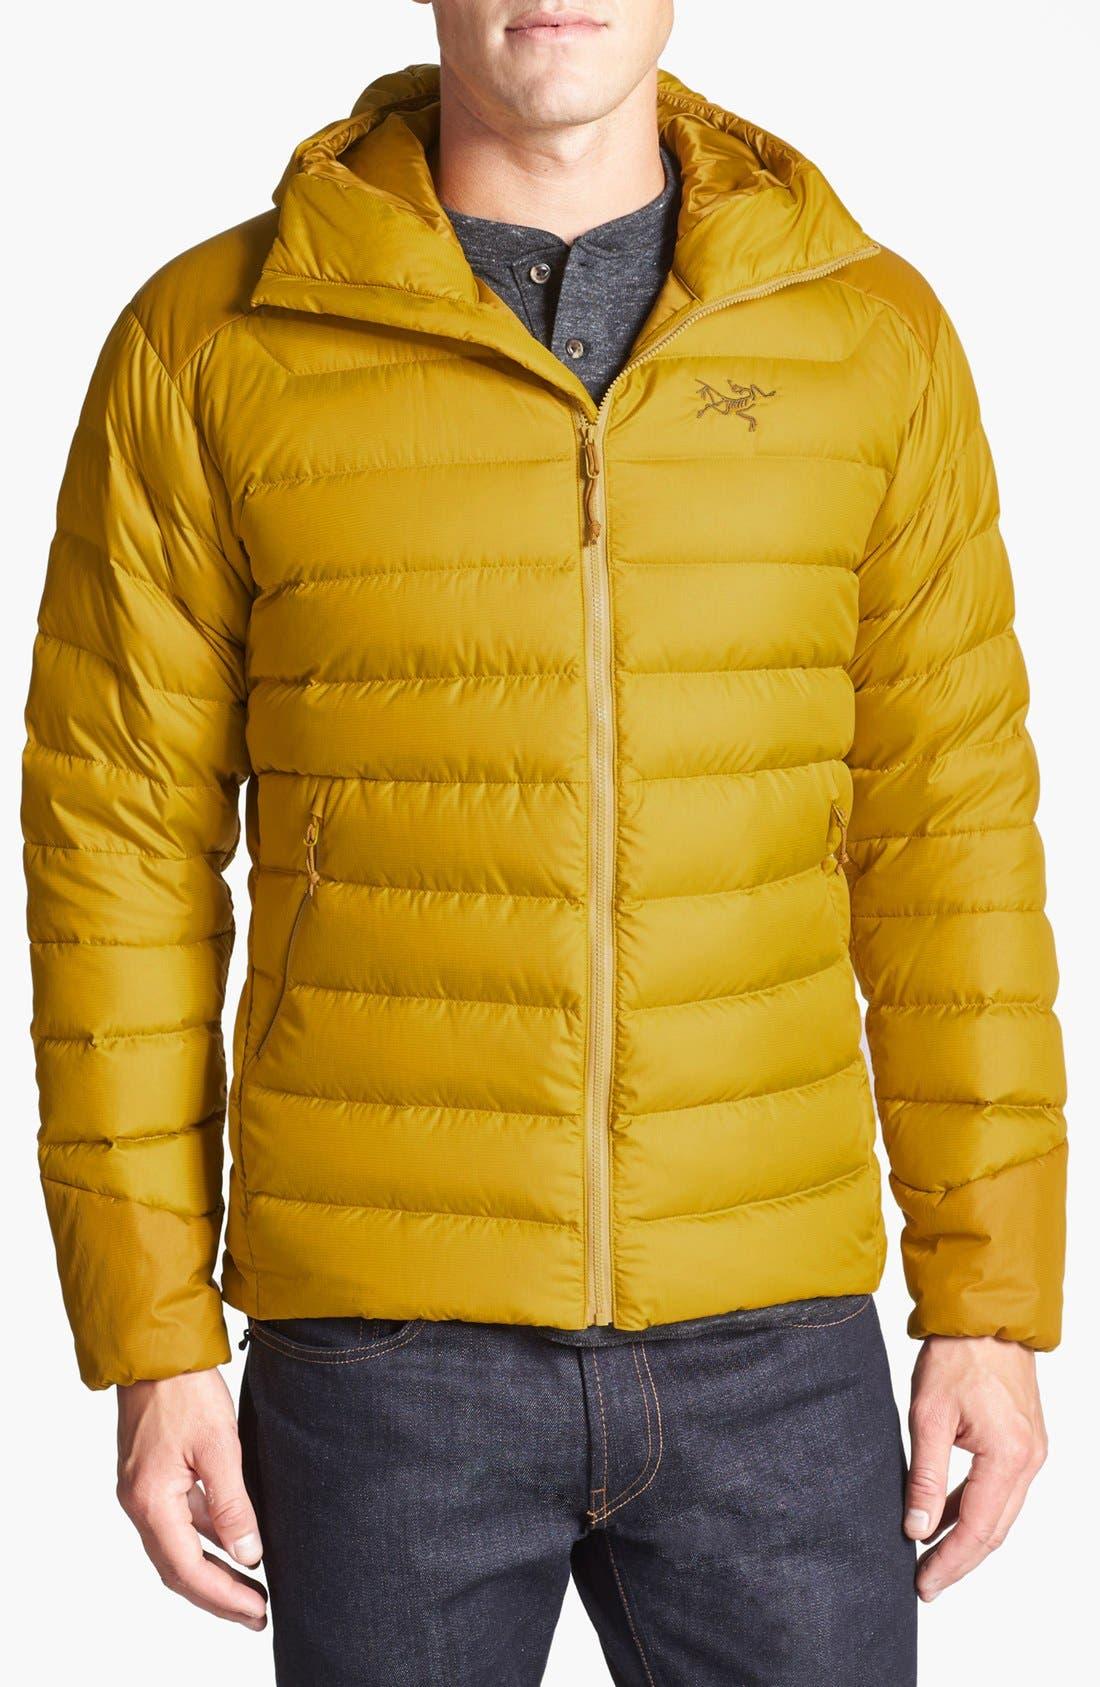 Main Image - Arc'teryx 'Thorium AR' Athletic Fit Hooded Down Jacket